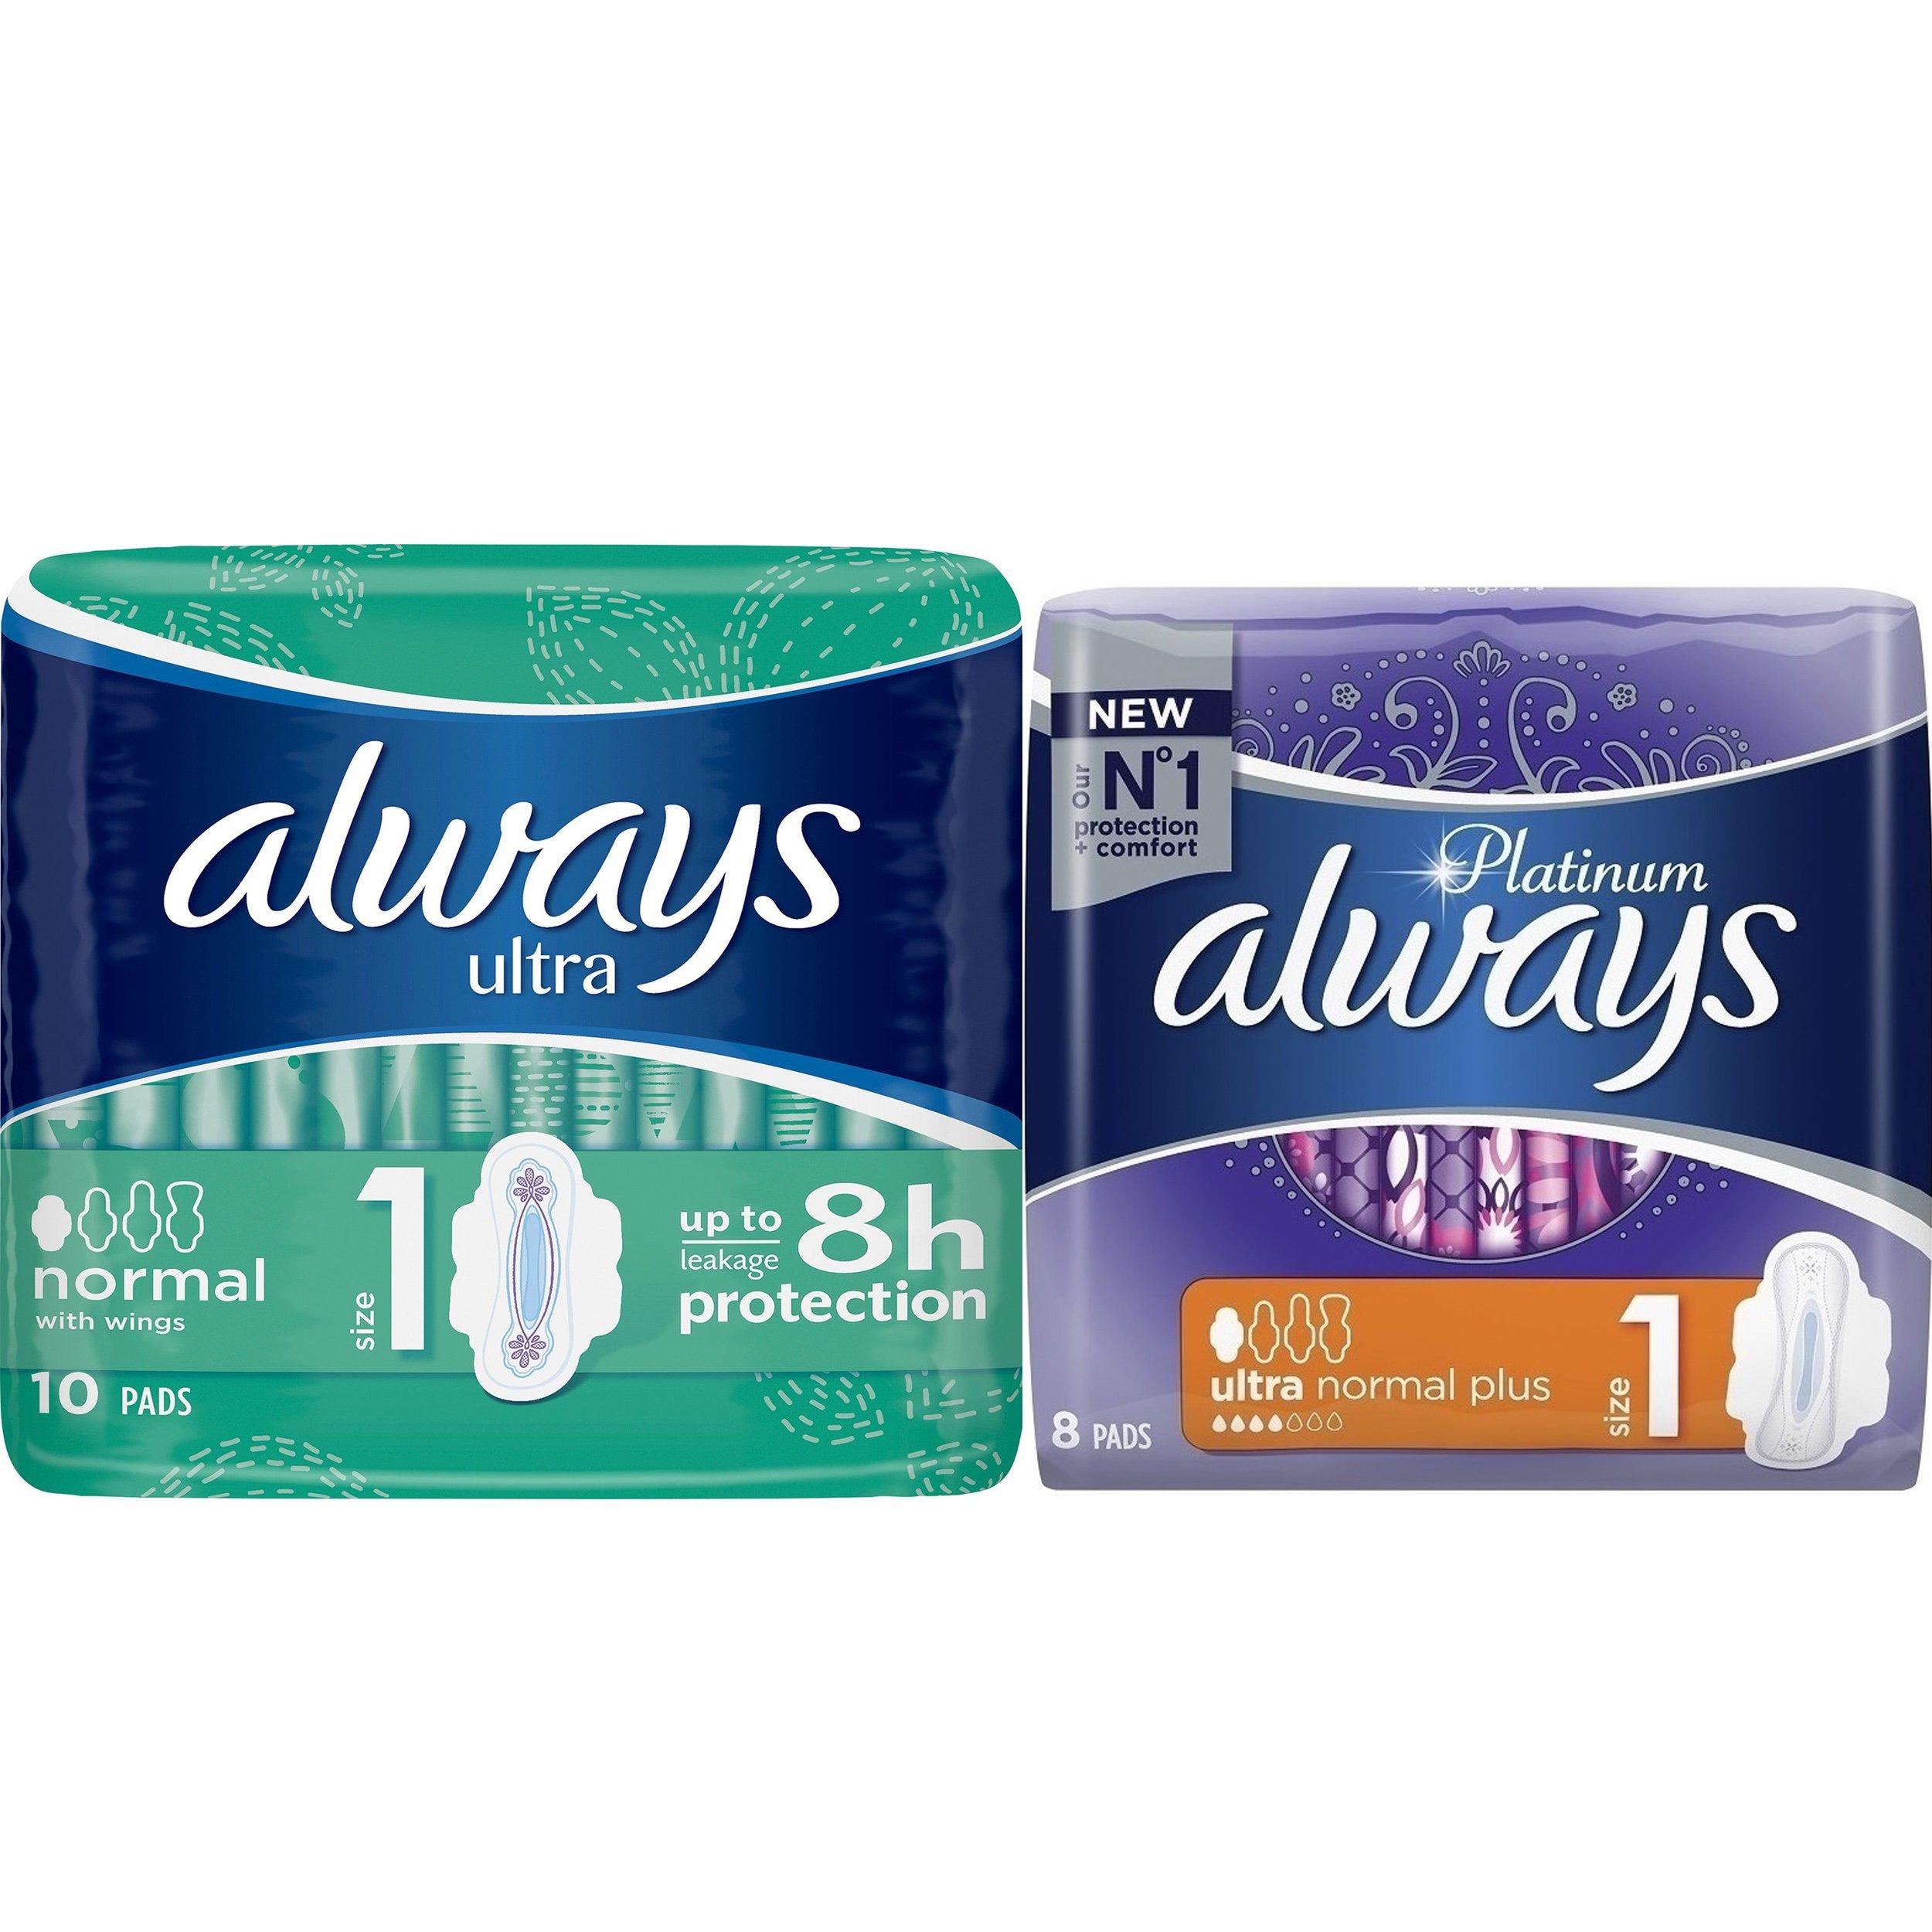 Always Πακέτο Προσφοράς Ultra Normal Σερβιέτες για 100% Προστασία 10 Τεμάχια & Platinum Normal Plus 8 Τεμάχια 1+1 Δώρο